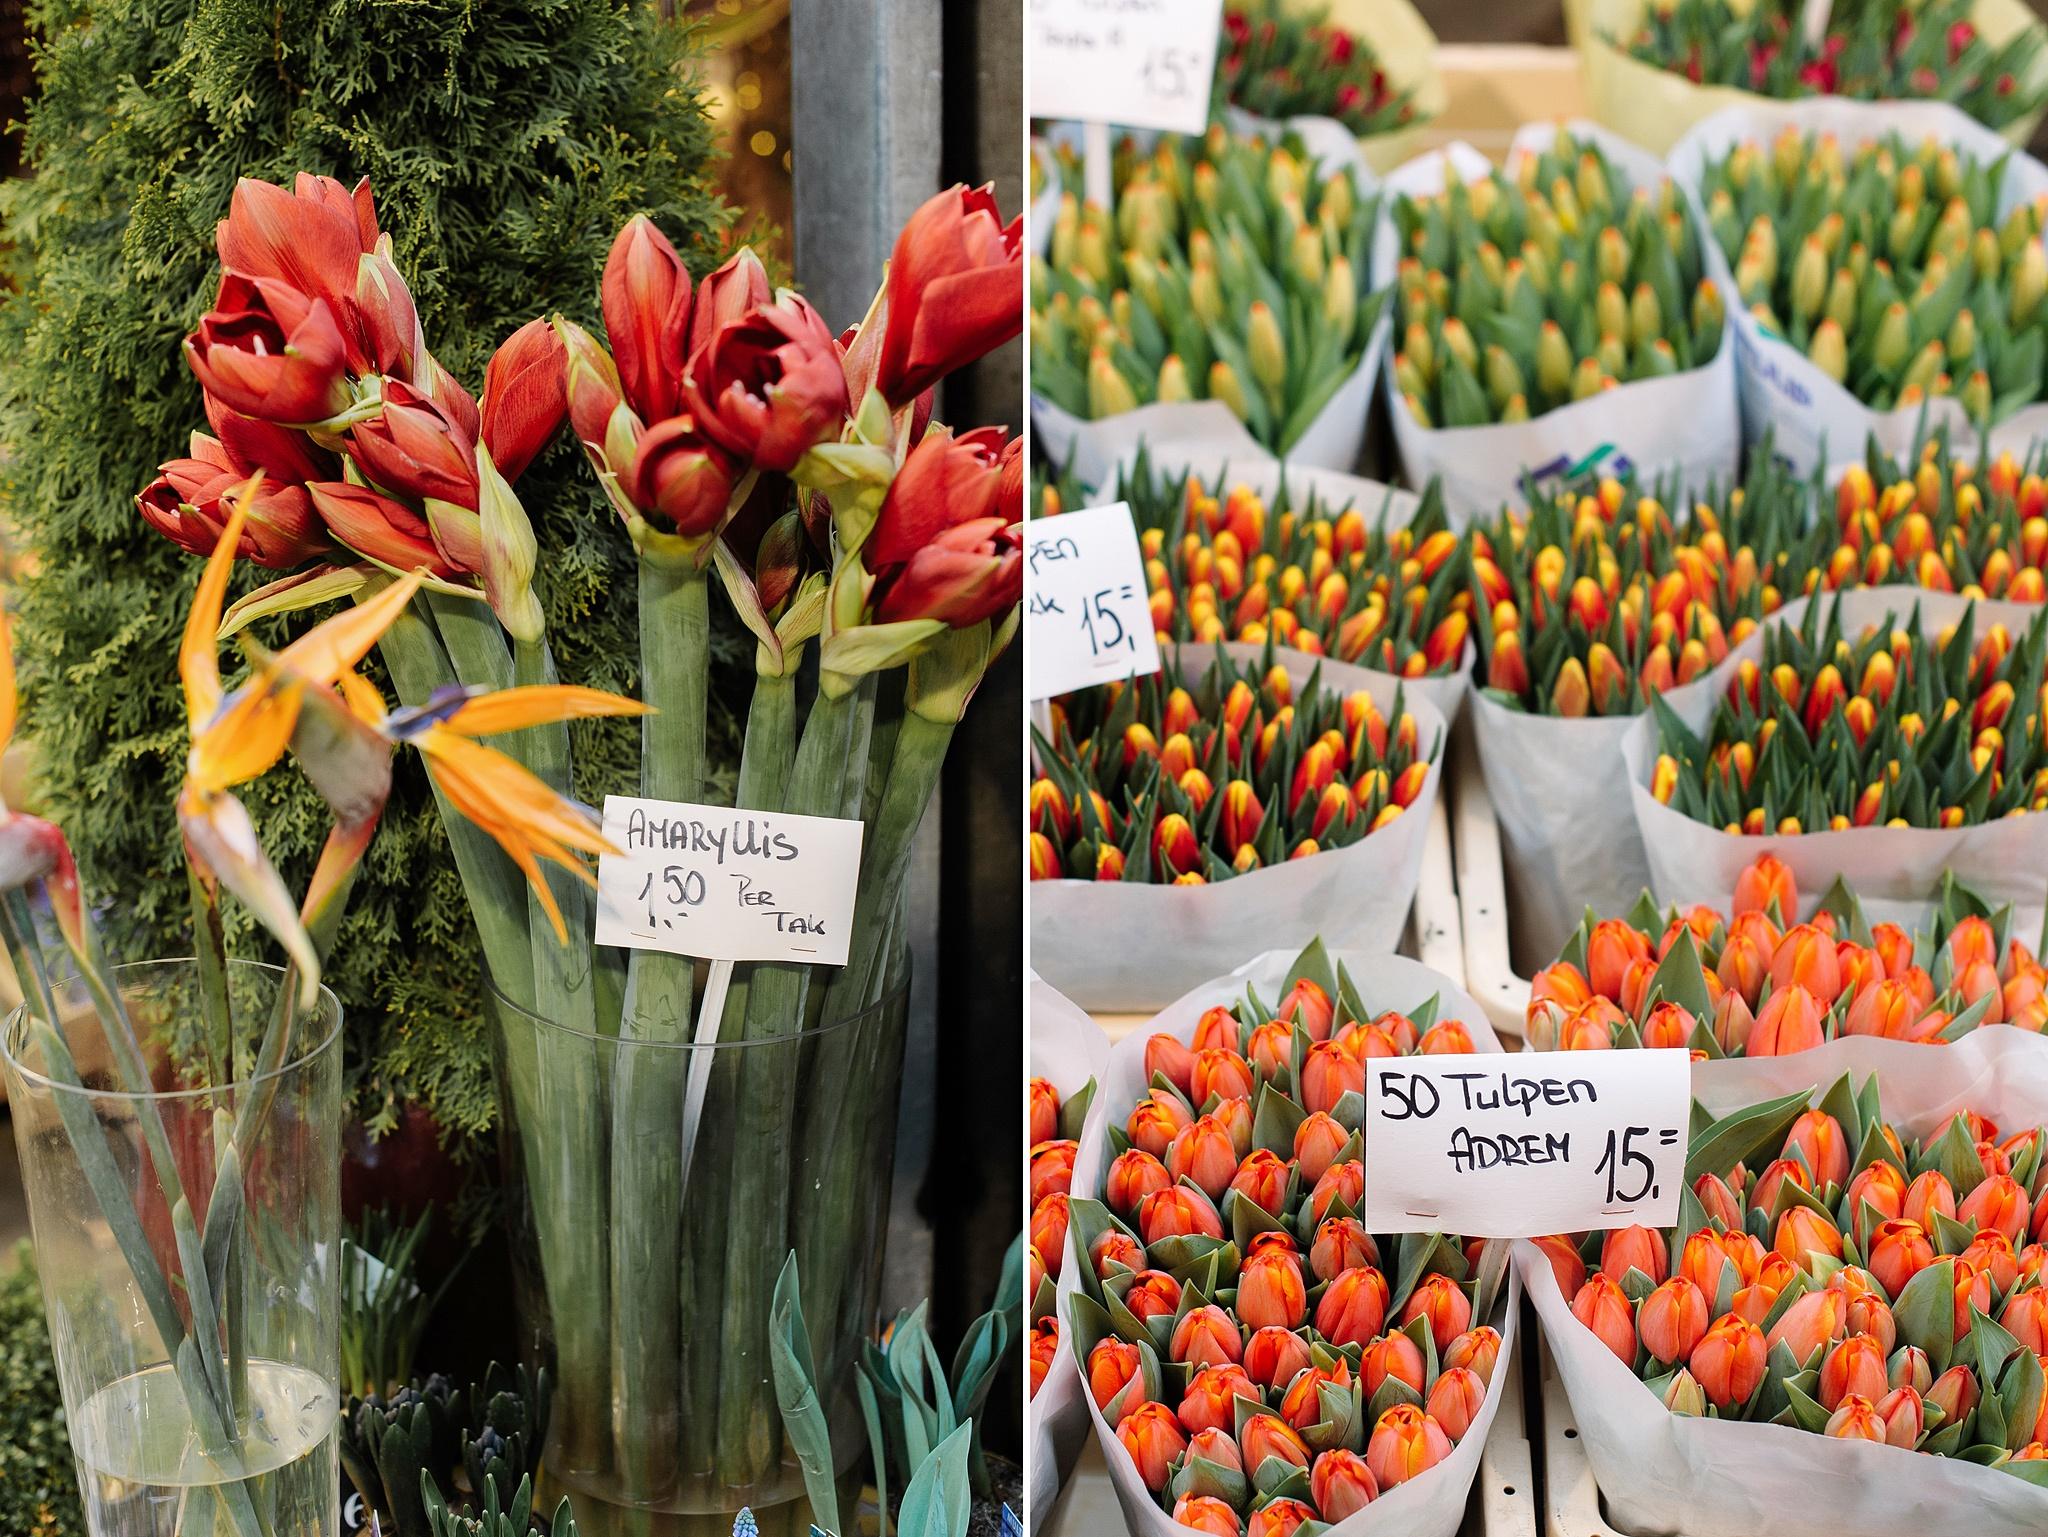 Сколько стоят цветы на Цветочном рынке Амстердама?